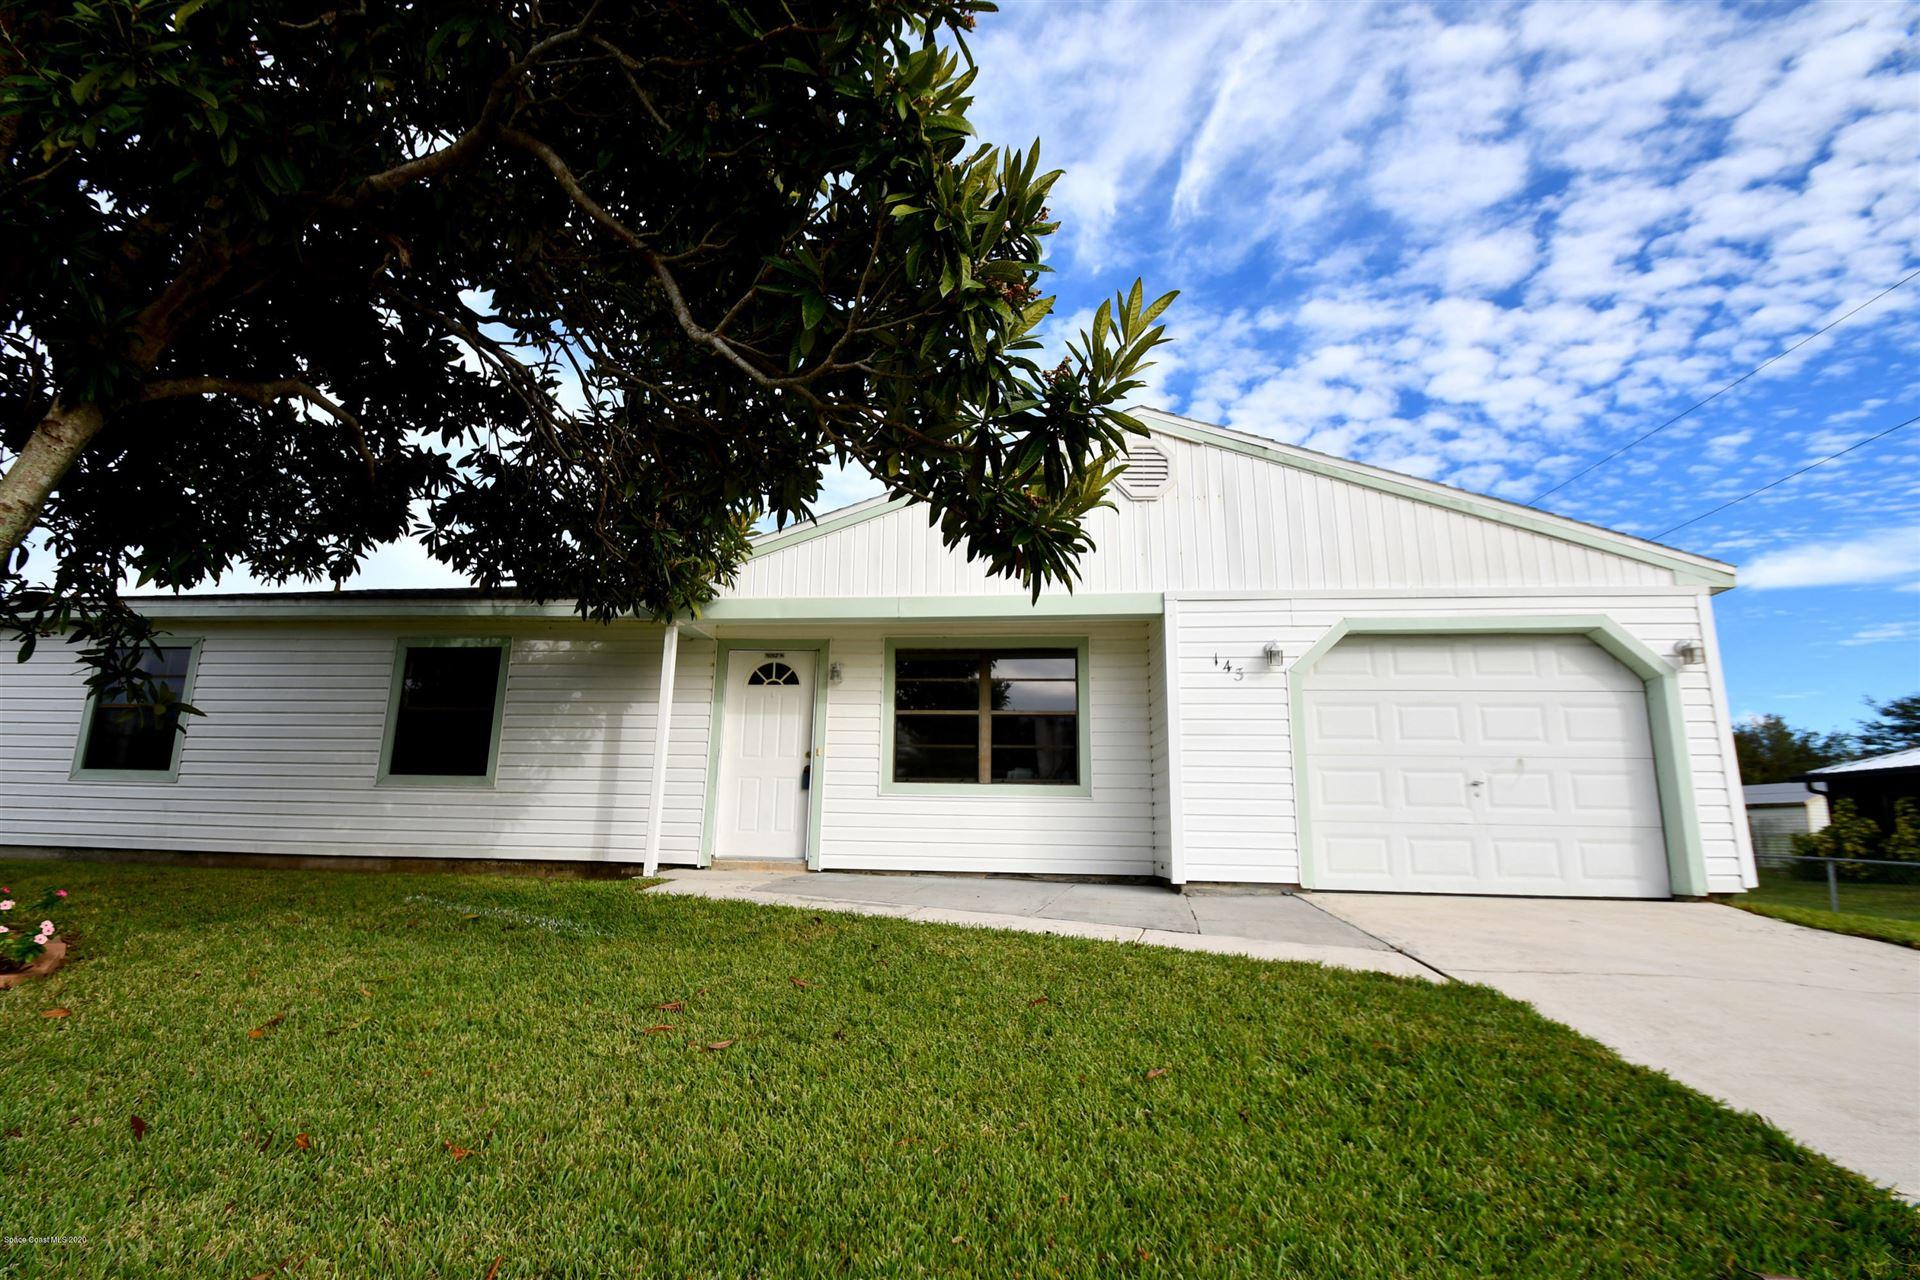 143 Abalone Road #143, Palm Bay, FL 32907 - #: 891324